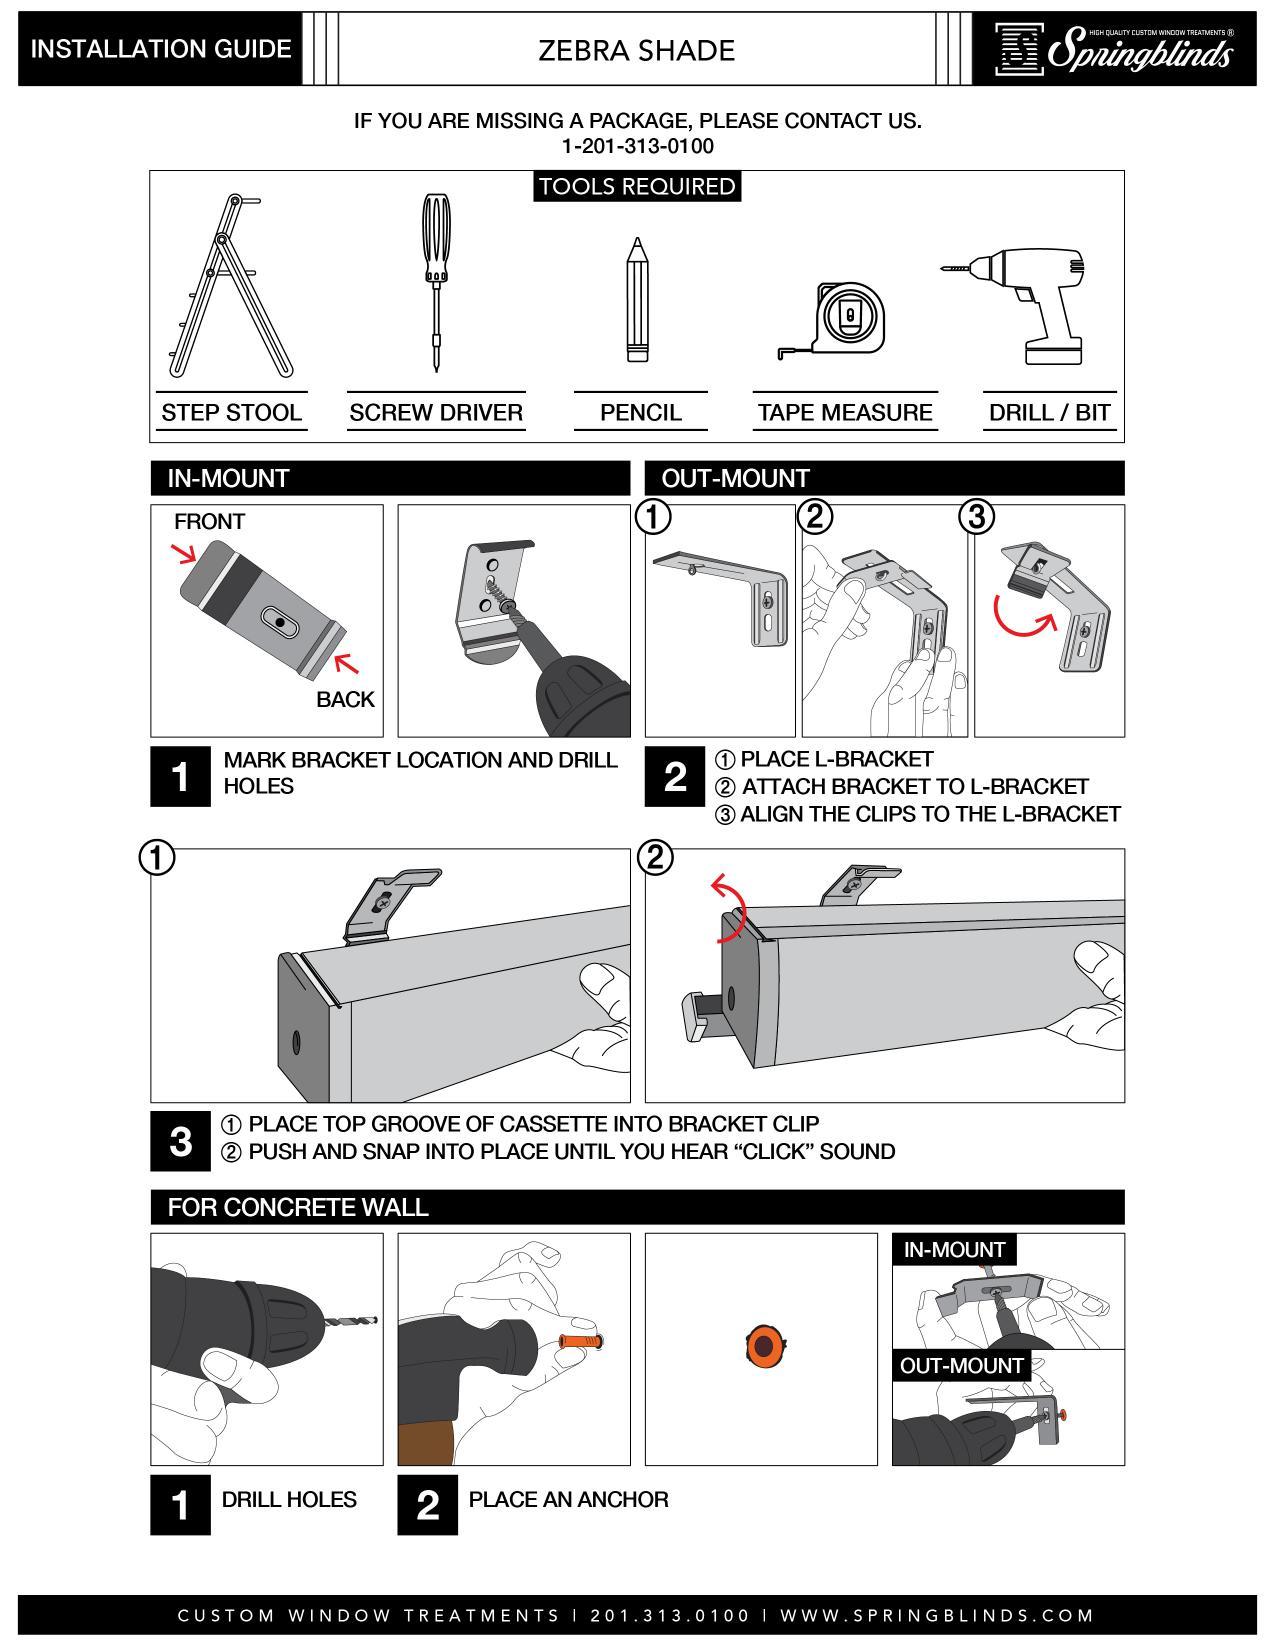 zebra-shade-installation-guide.jpg